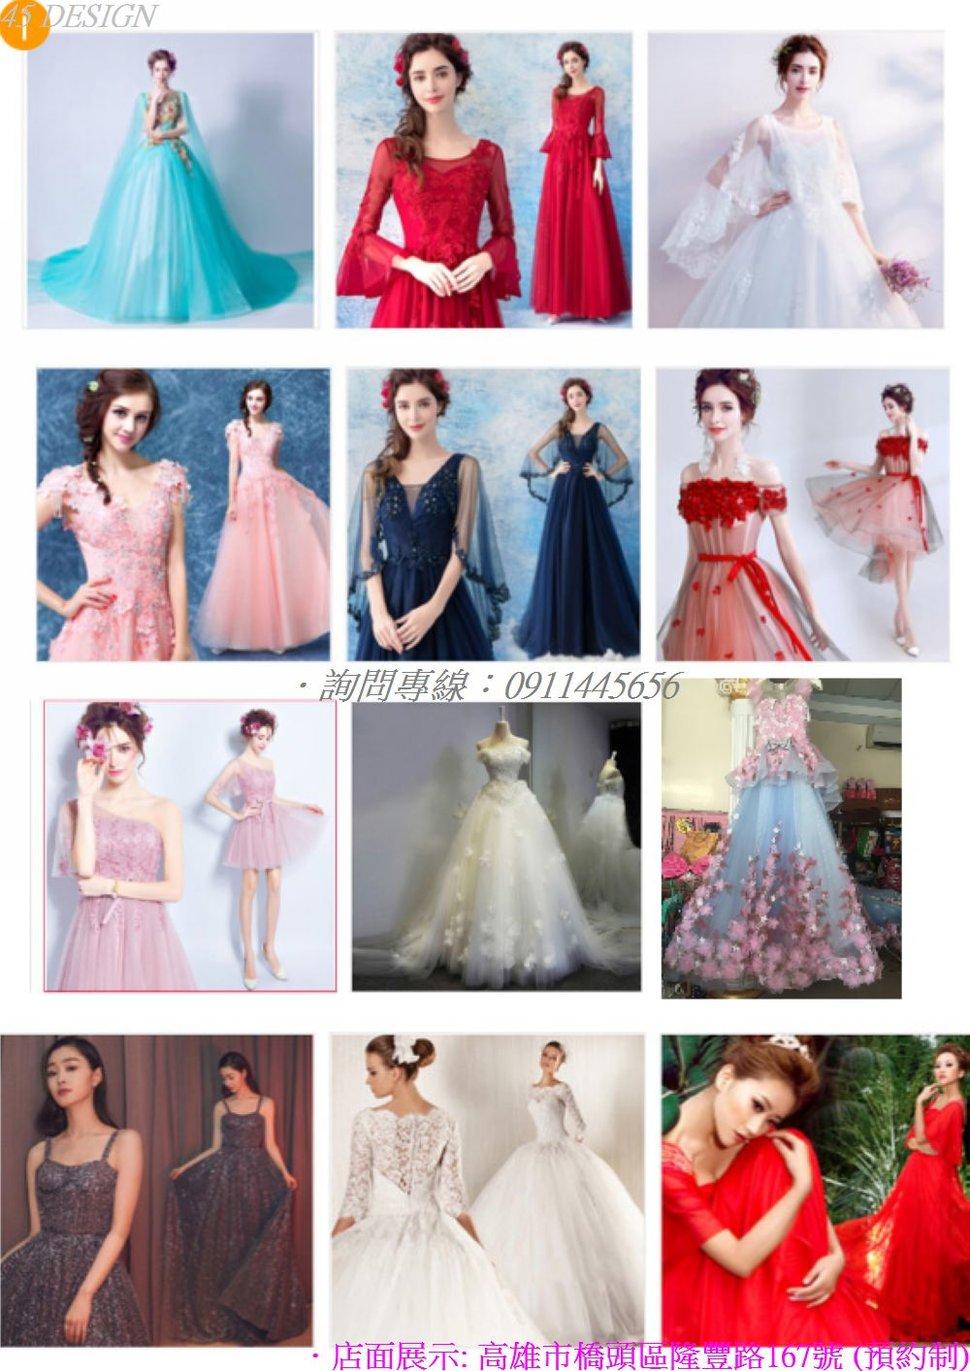 msl19081528A80D47BEEE472BBD406AA7F0510934 - 全台最便宜-45DESIGN四五婚紗禮服《結婚吧》